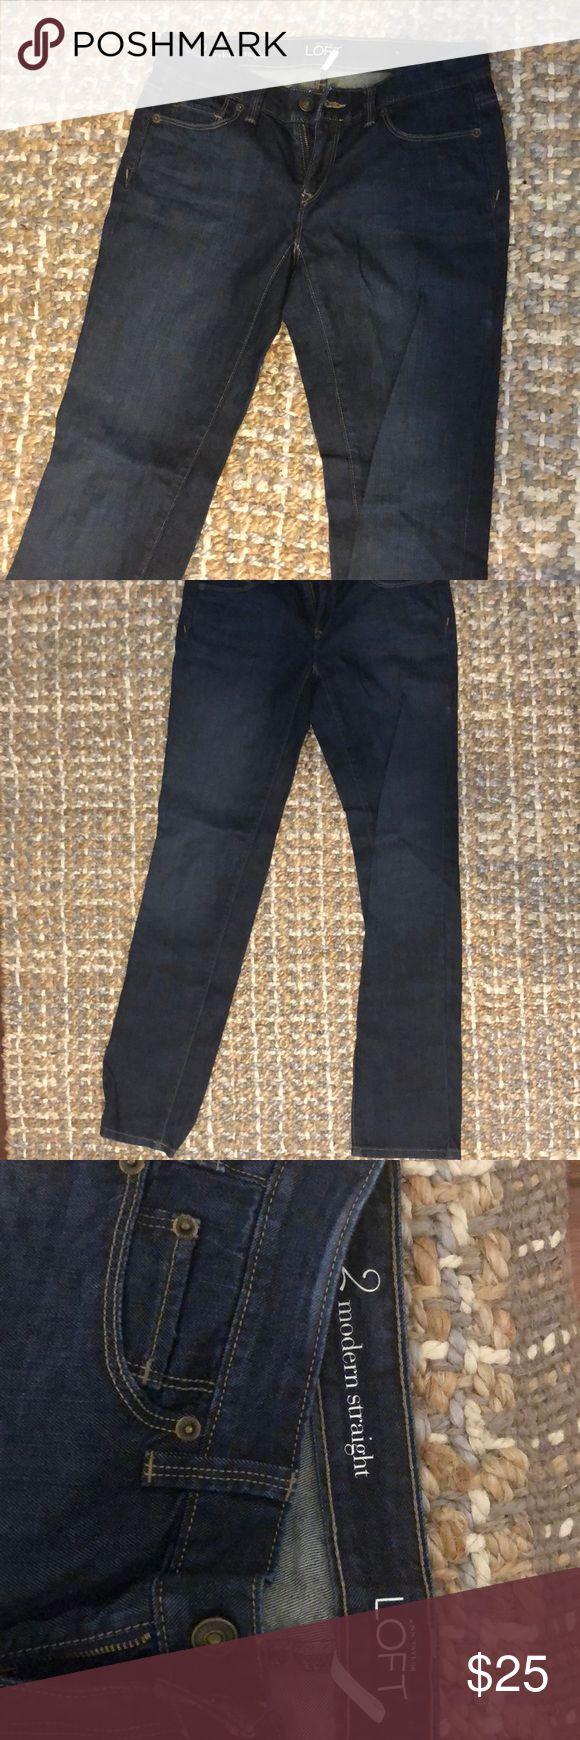 Loft modern straight cut jean Loft dark modern straight cut jeans. LOFT Jeans Straight Leg